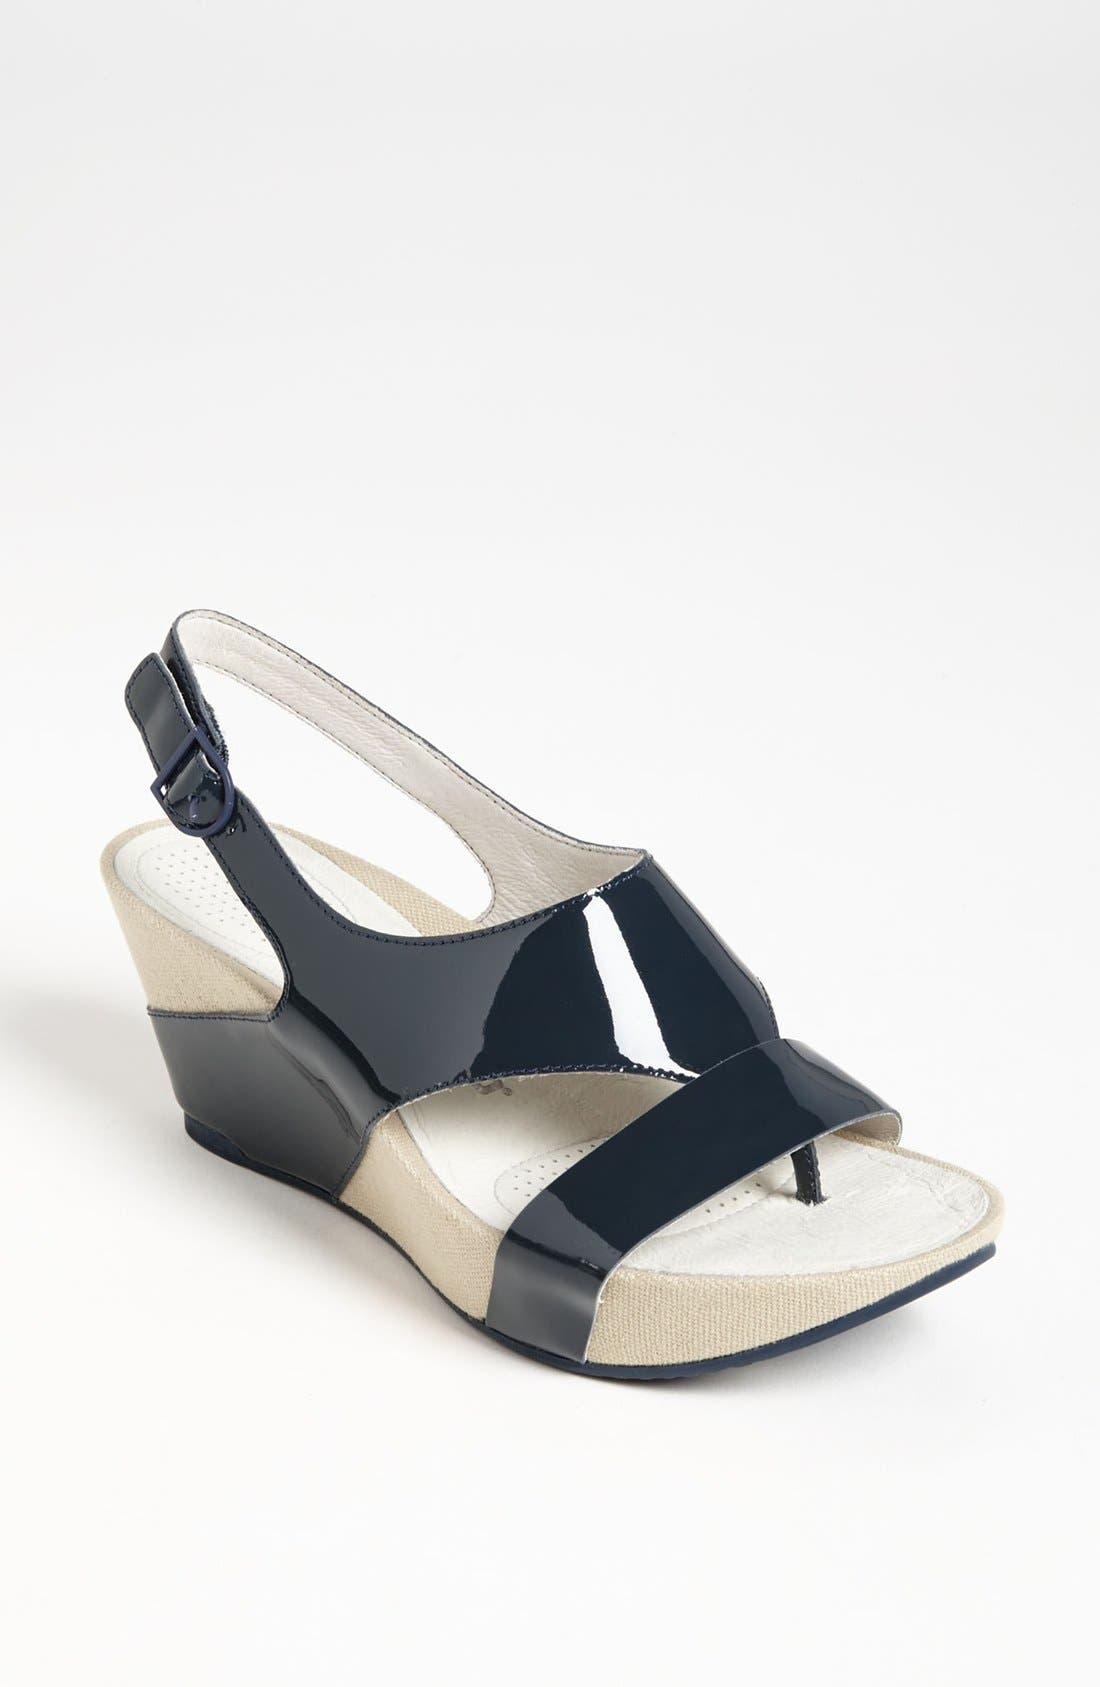 Main Image - Tsubo 'Olisa' Sandal